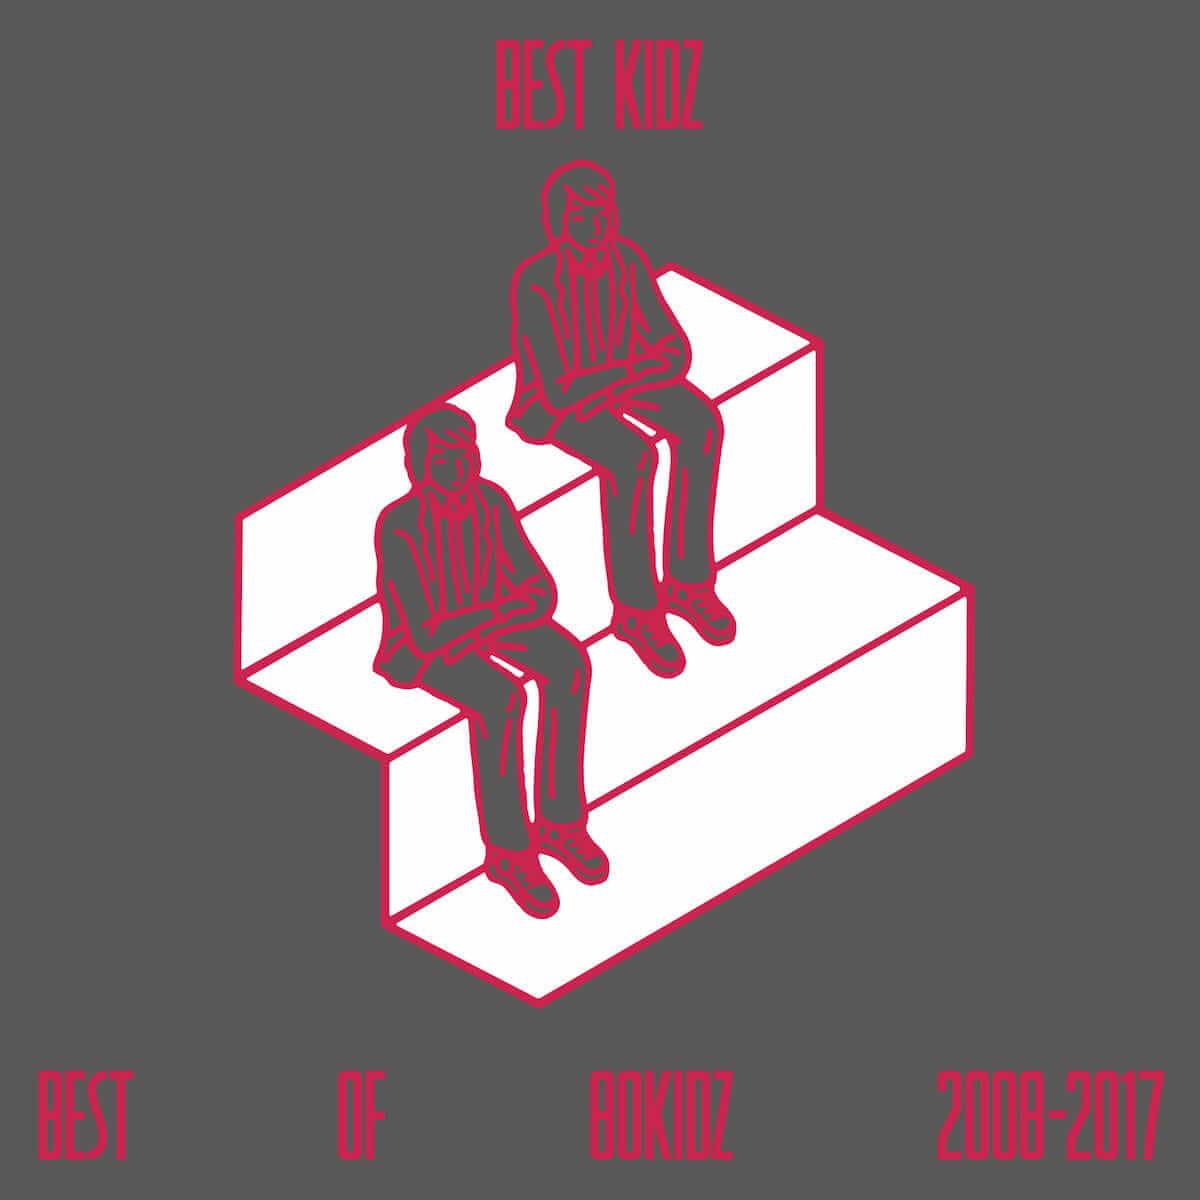 80KIDZのデビュー10周年WEB SHOPがオープン ベスト盤やリミックス集、YOSHIROTTENとのコラボTシャツのプレオーダー開始 music180804-80kidz10thanniv-3-1200x1200